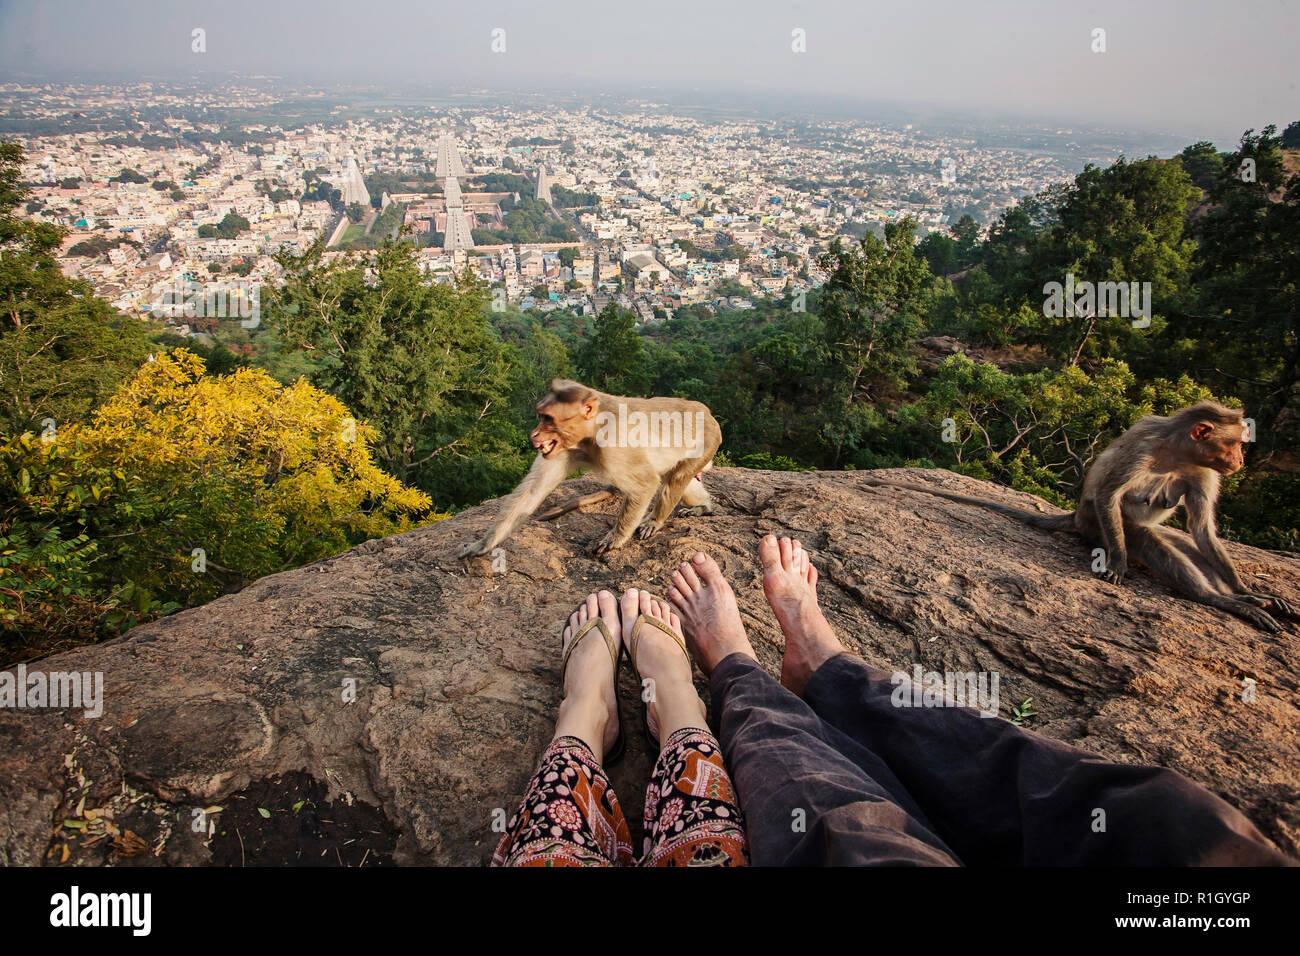 Couple legs sitting at Arunachala mountain view, Tiruvannamalai, Tamil Nadu, India - Stock Image